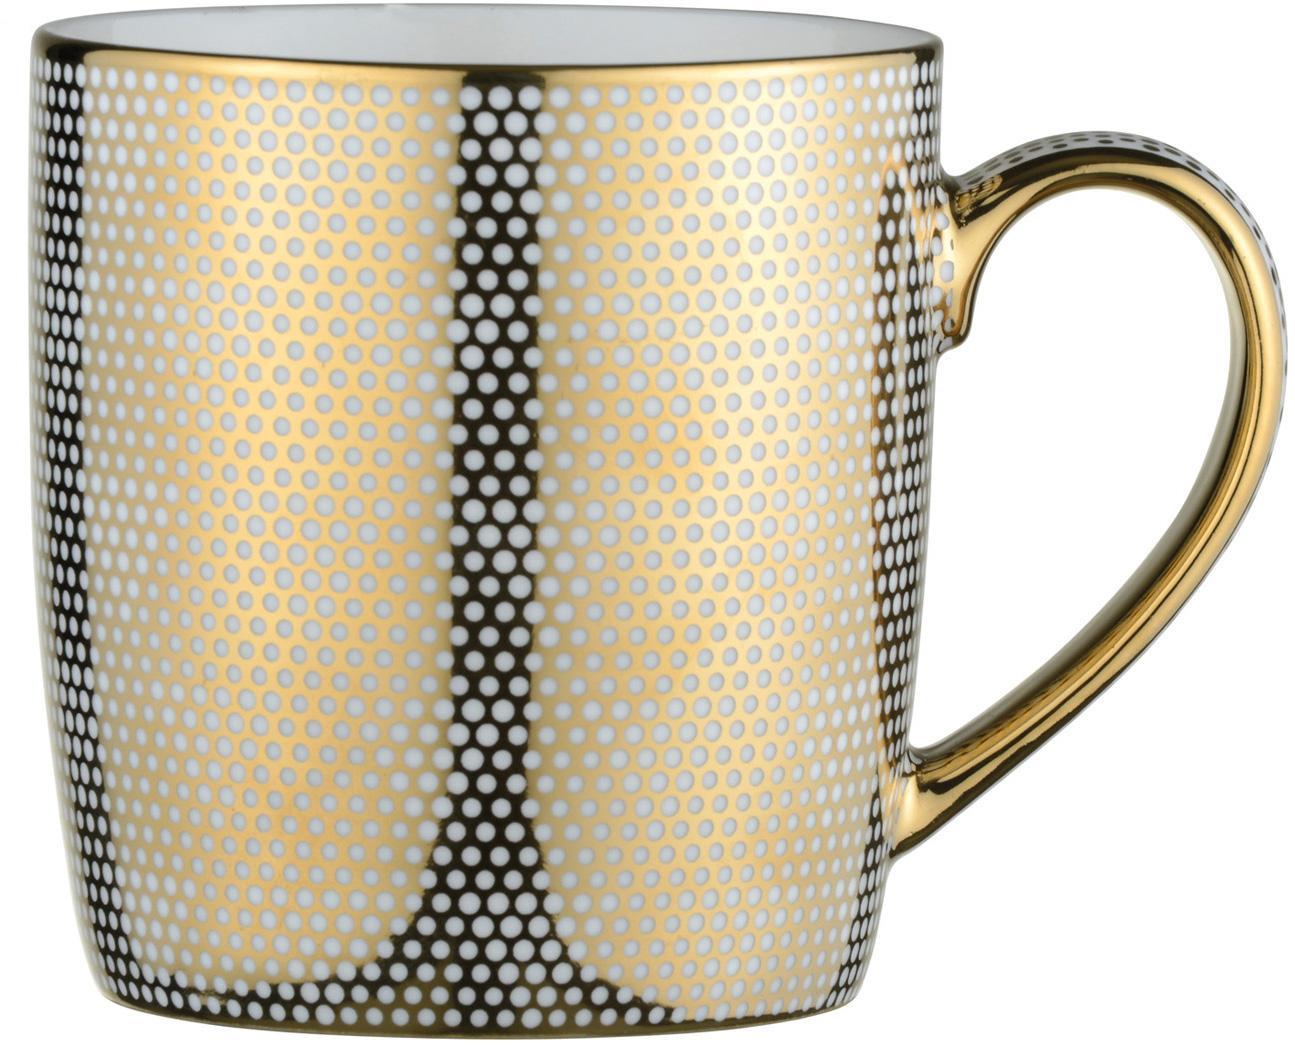 Mokken Dots, 4 stuks, Porselein, Wit, goudkleurig, Ø 9 x H 10 cm